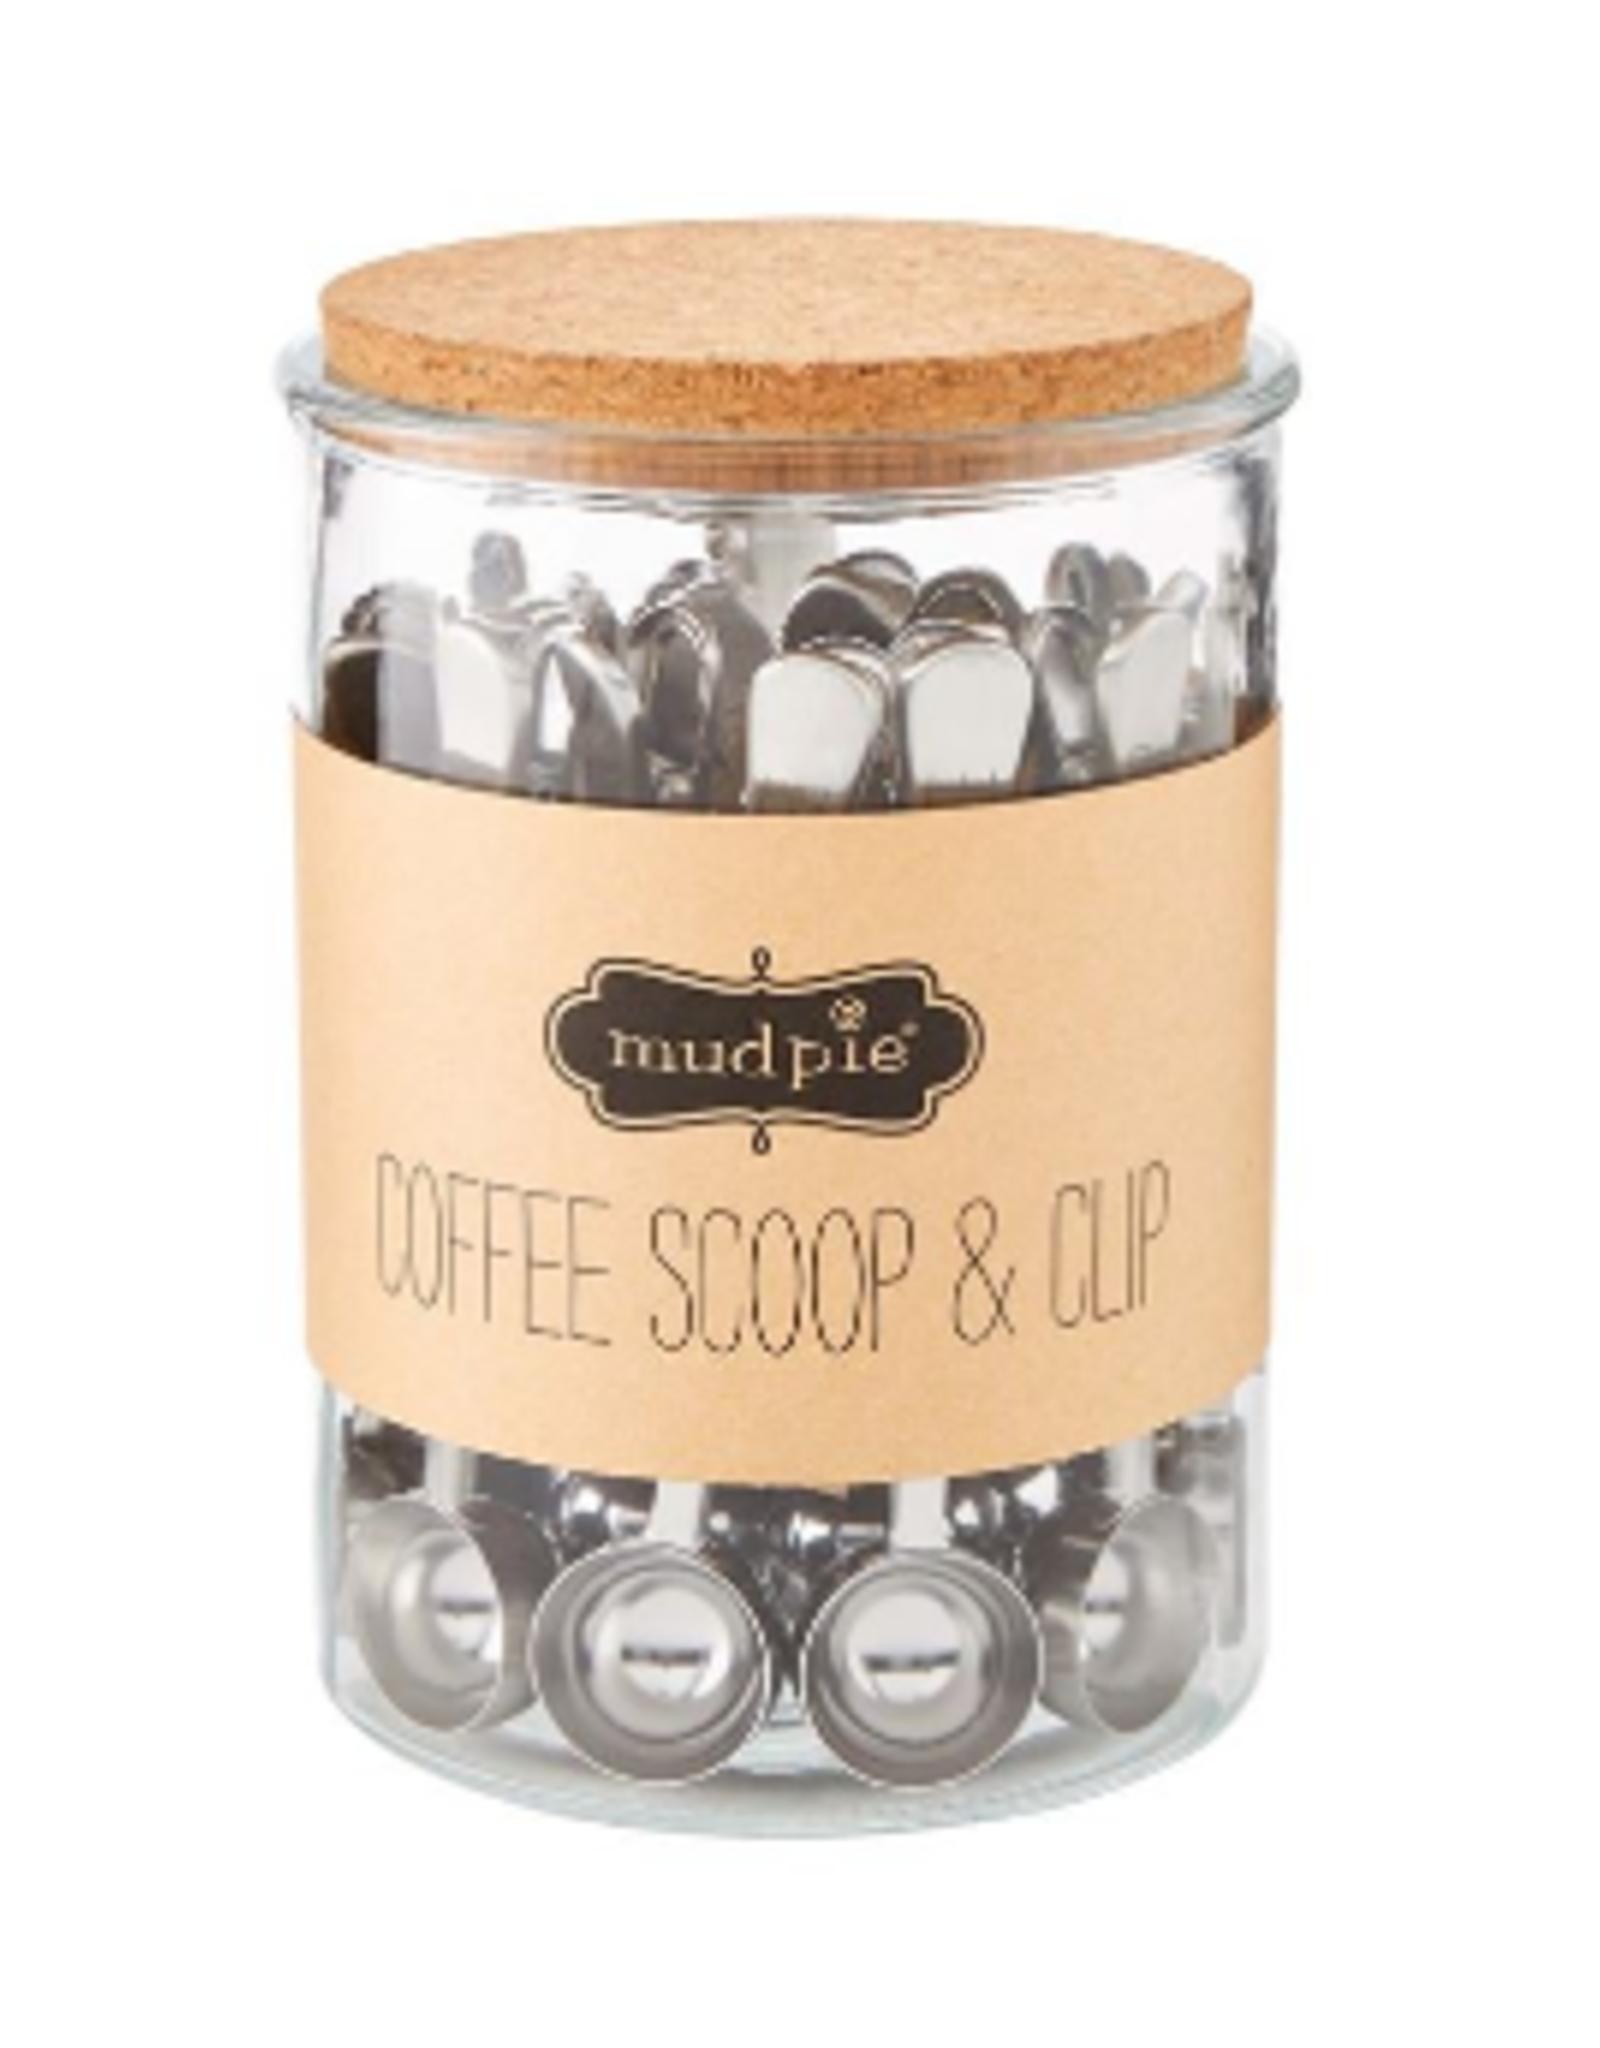 Coffee Scoop & Clip